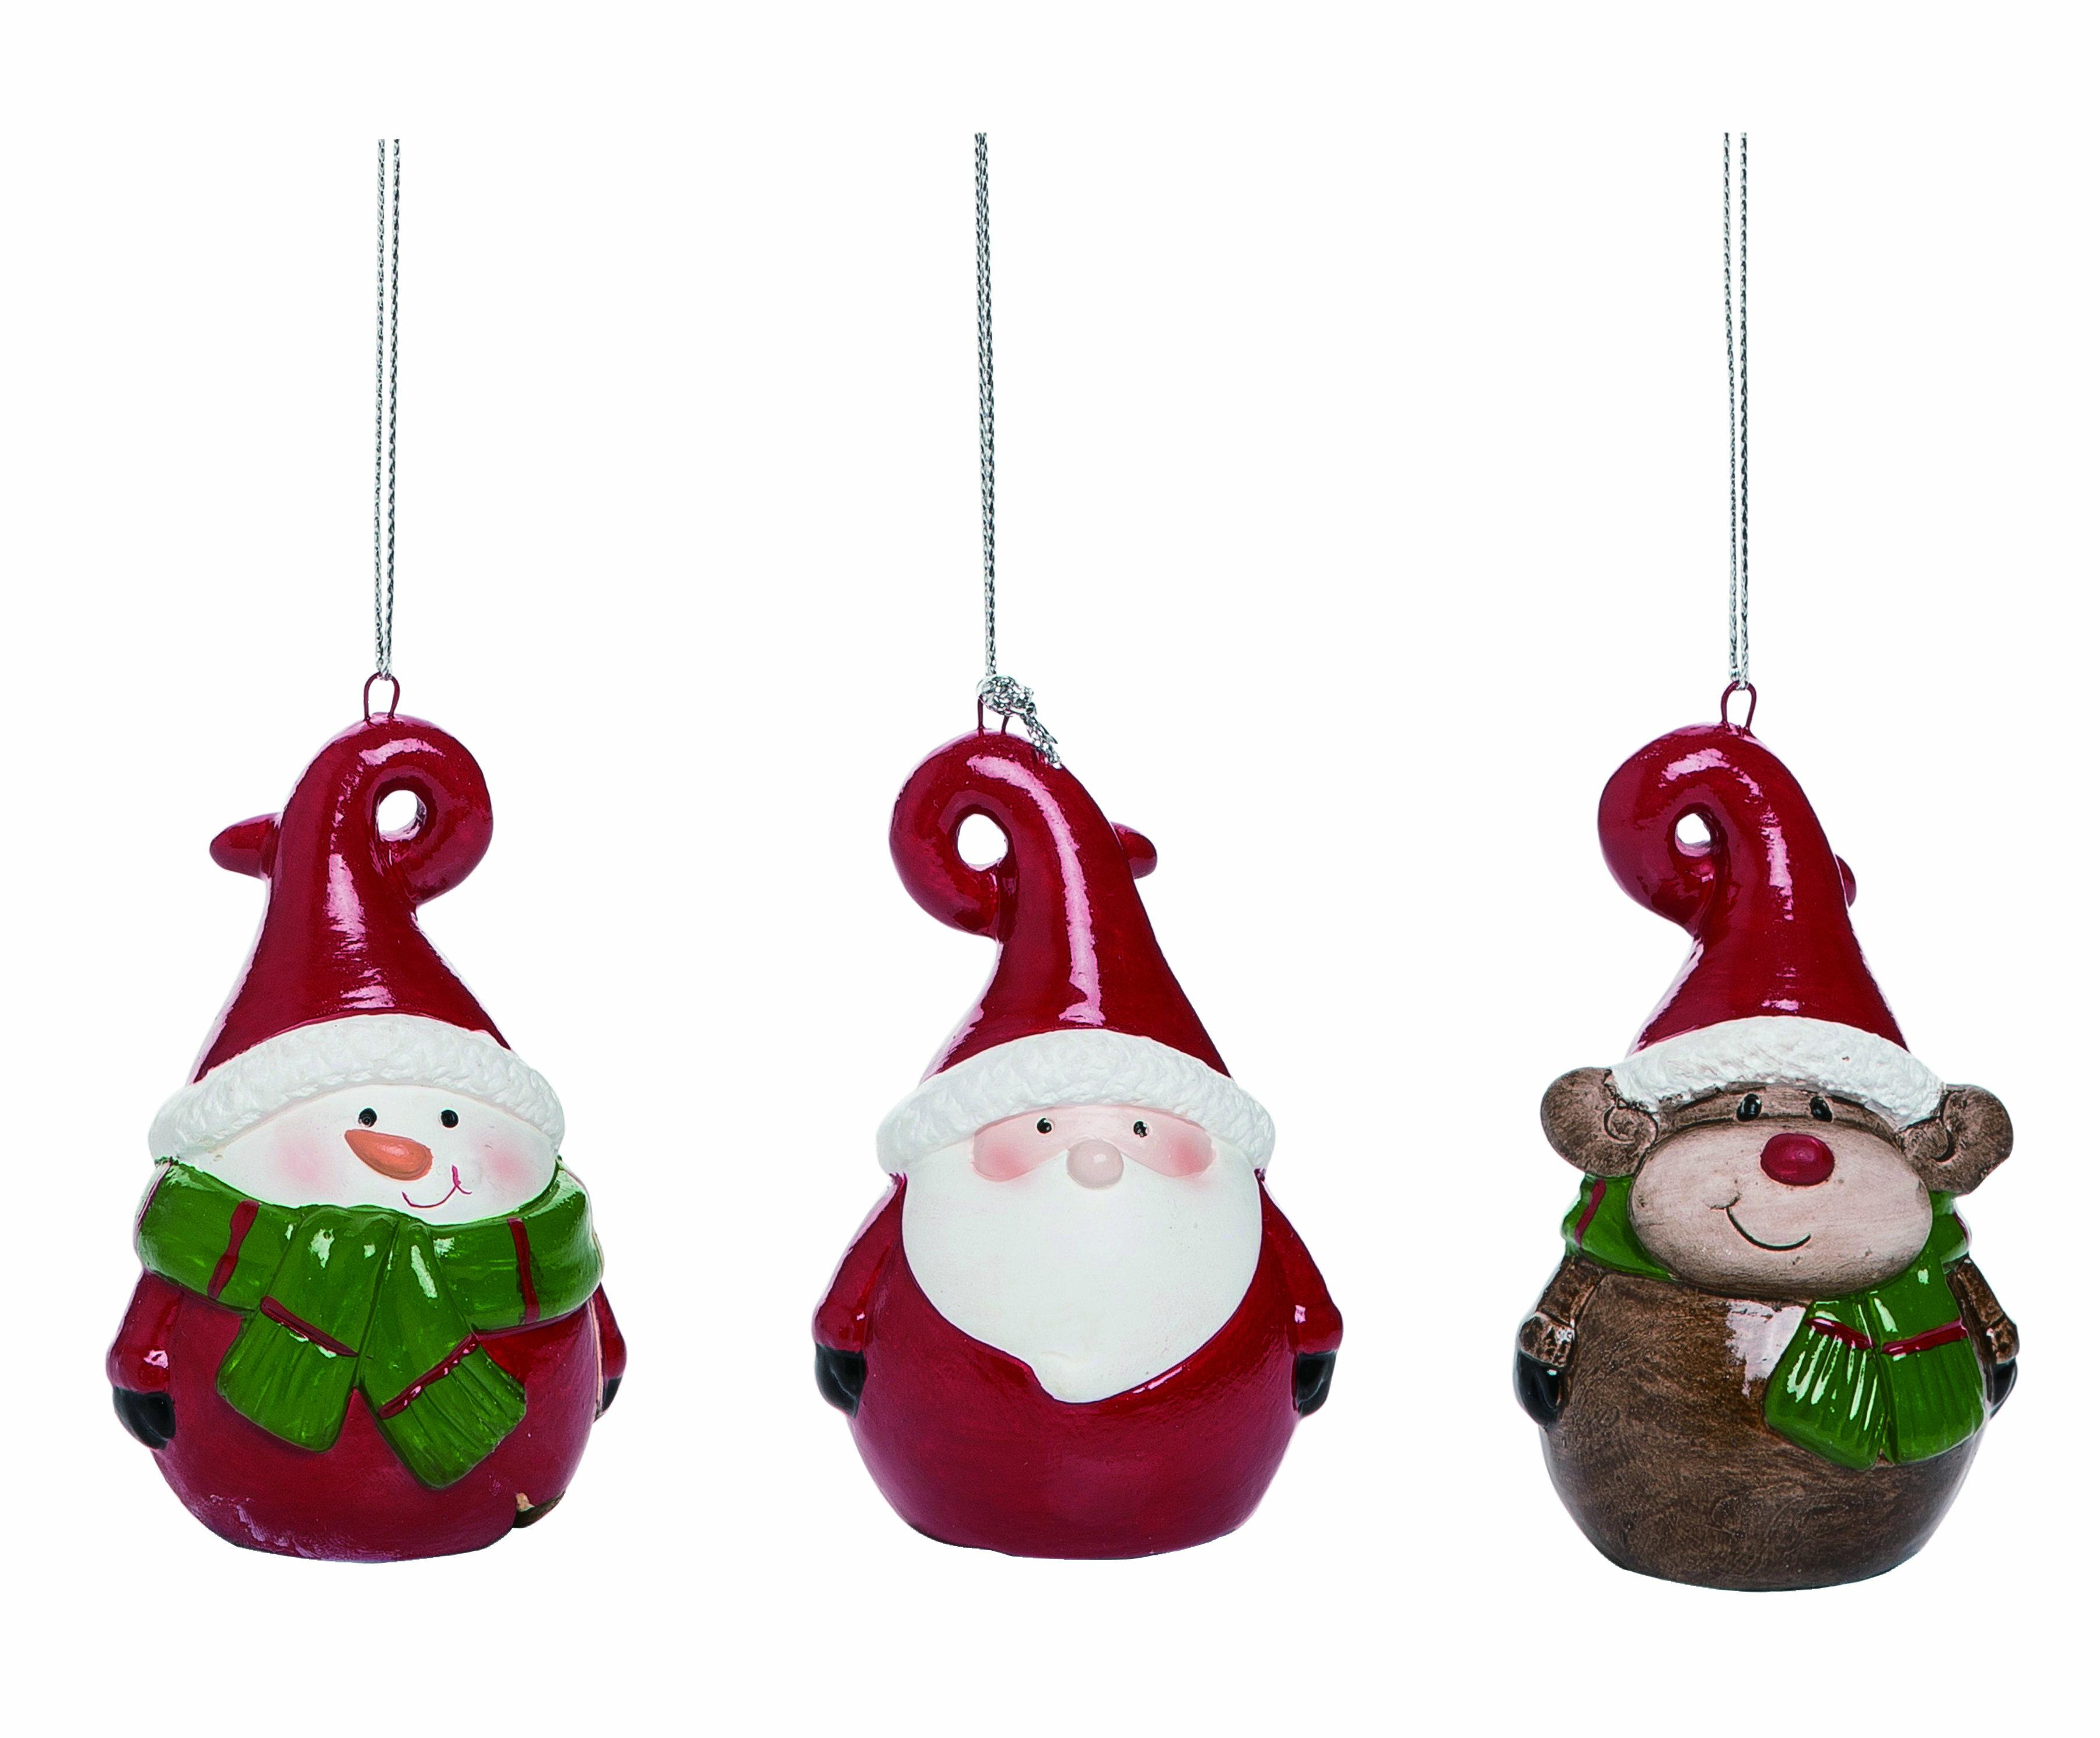 The Holiday Aisle 3 Piece Terracotta Santa Snowman And Reindeer Hanging Figurine Ornament Set Wayfair